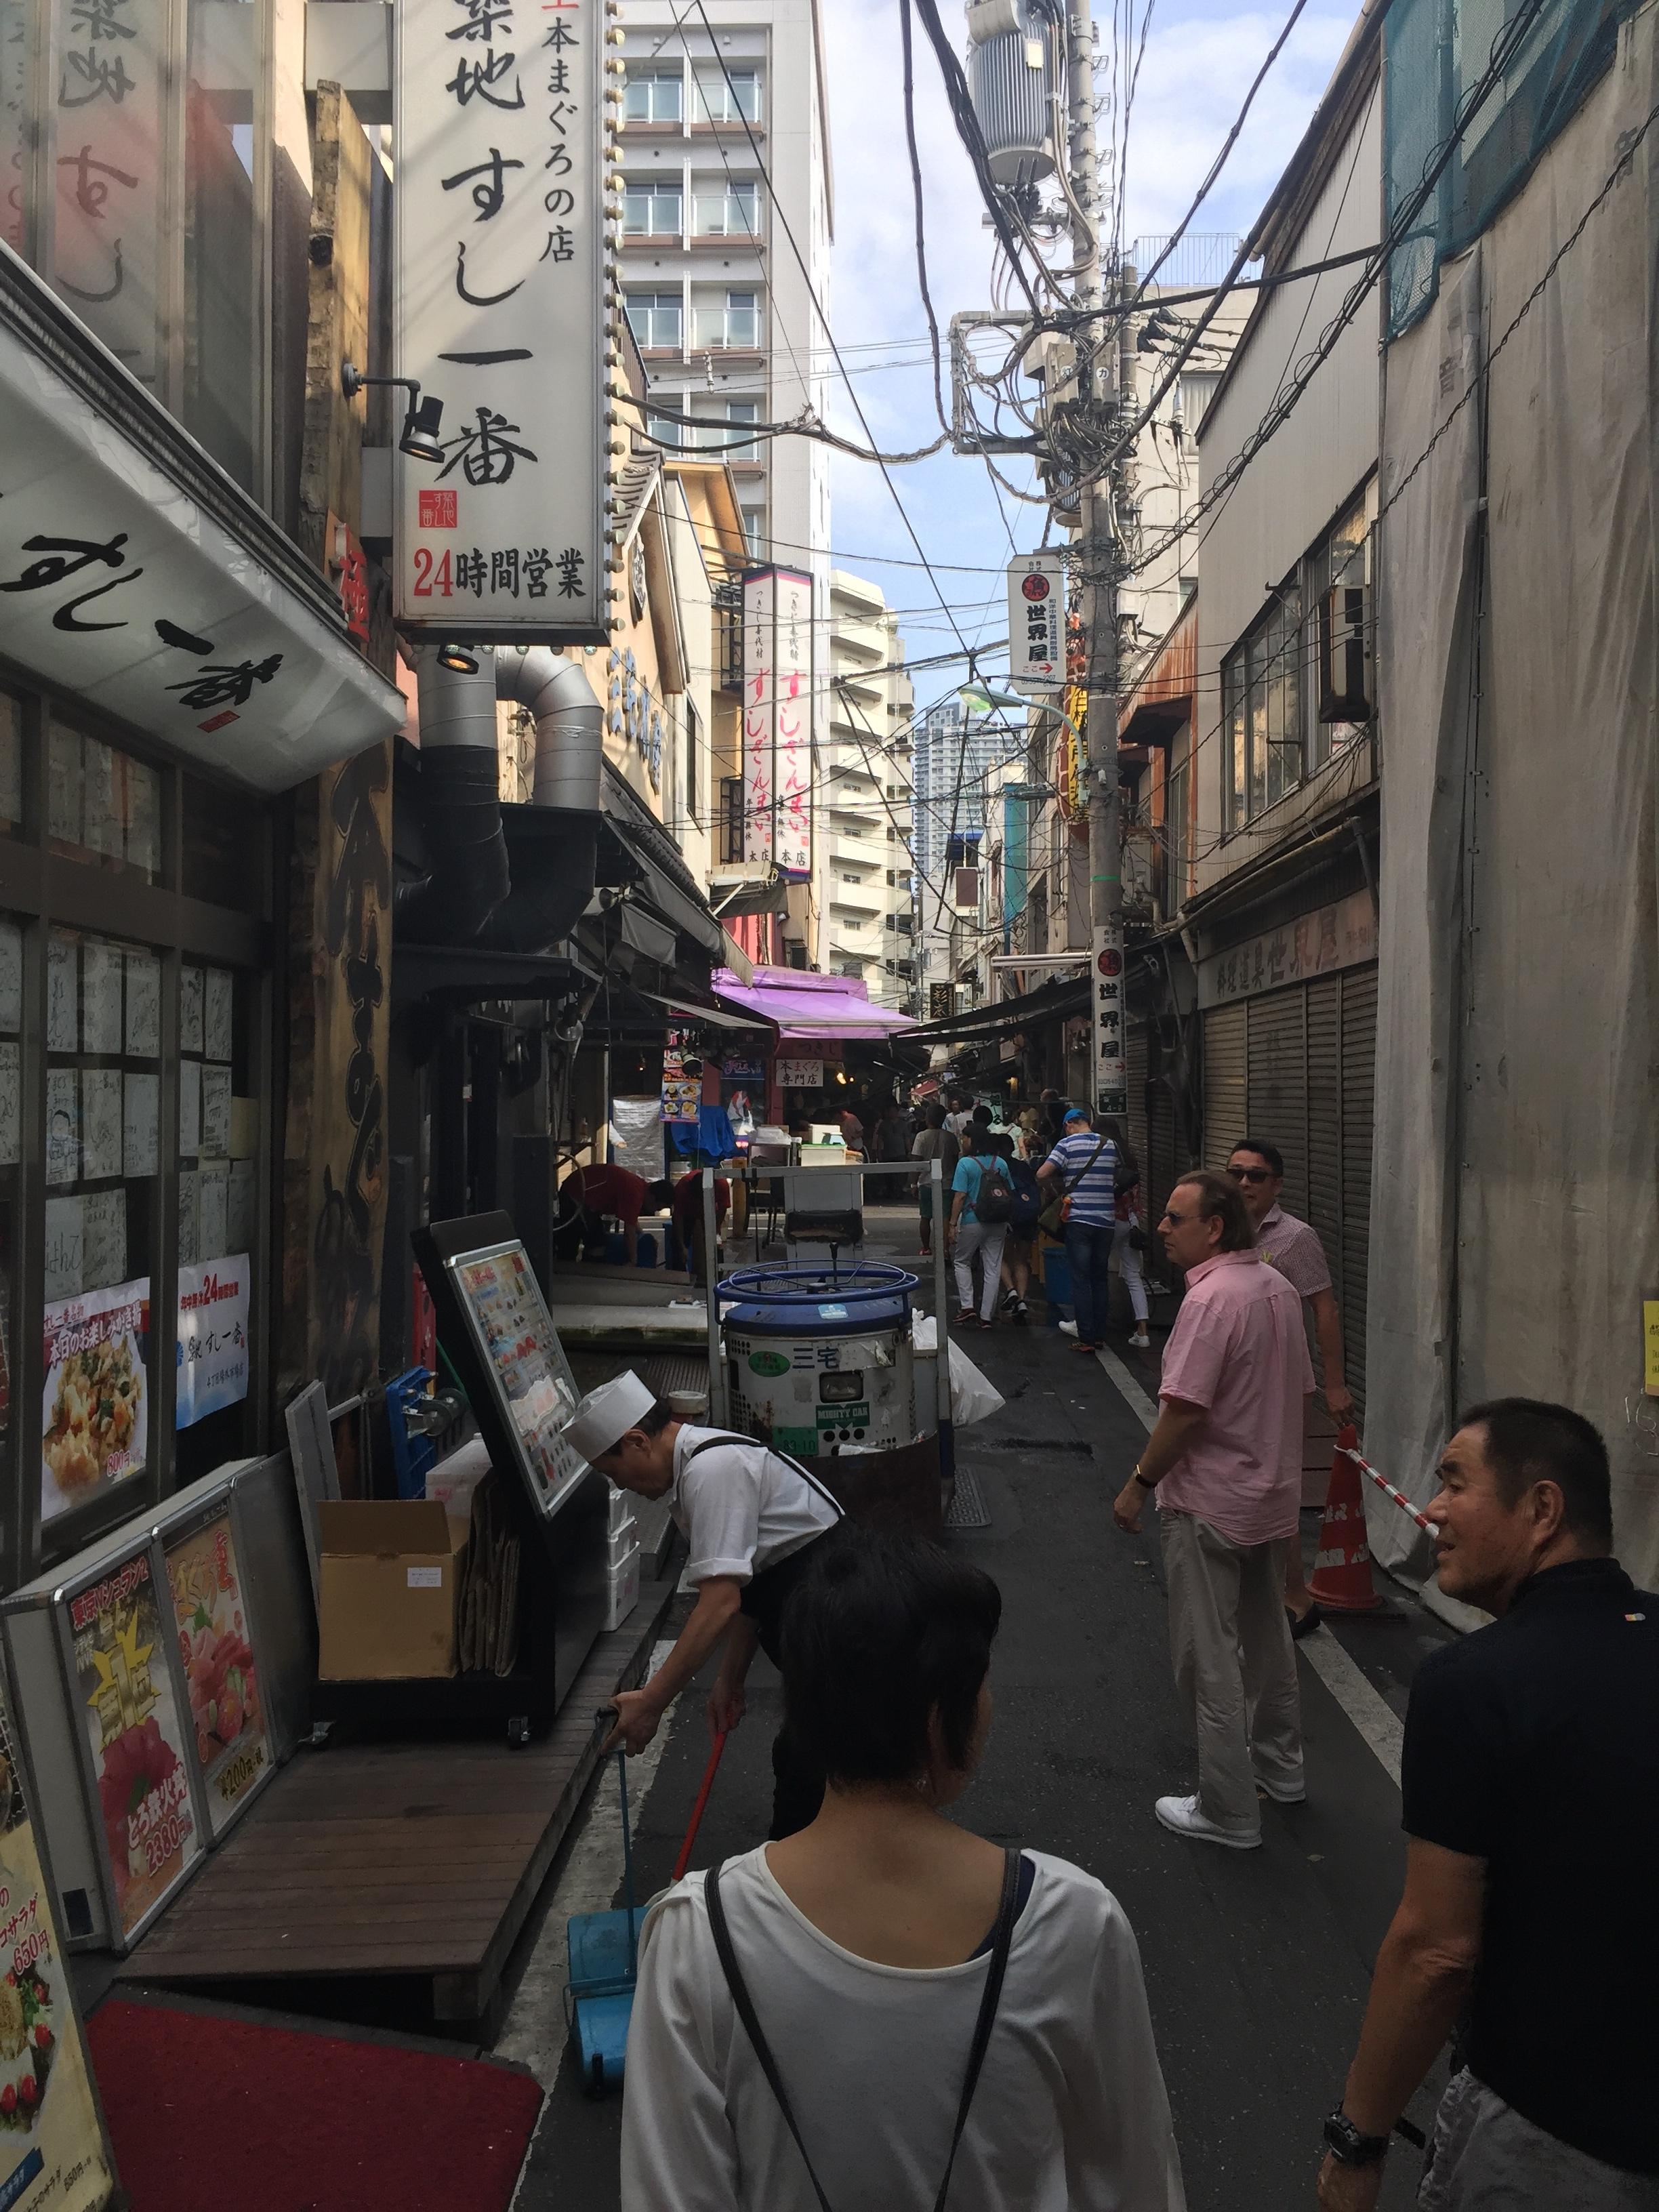 Photo 27-08-2017, 14 48 18 (1).jpg